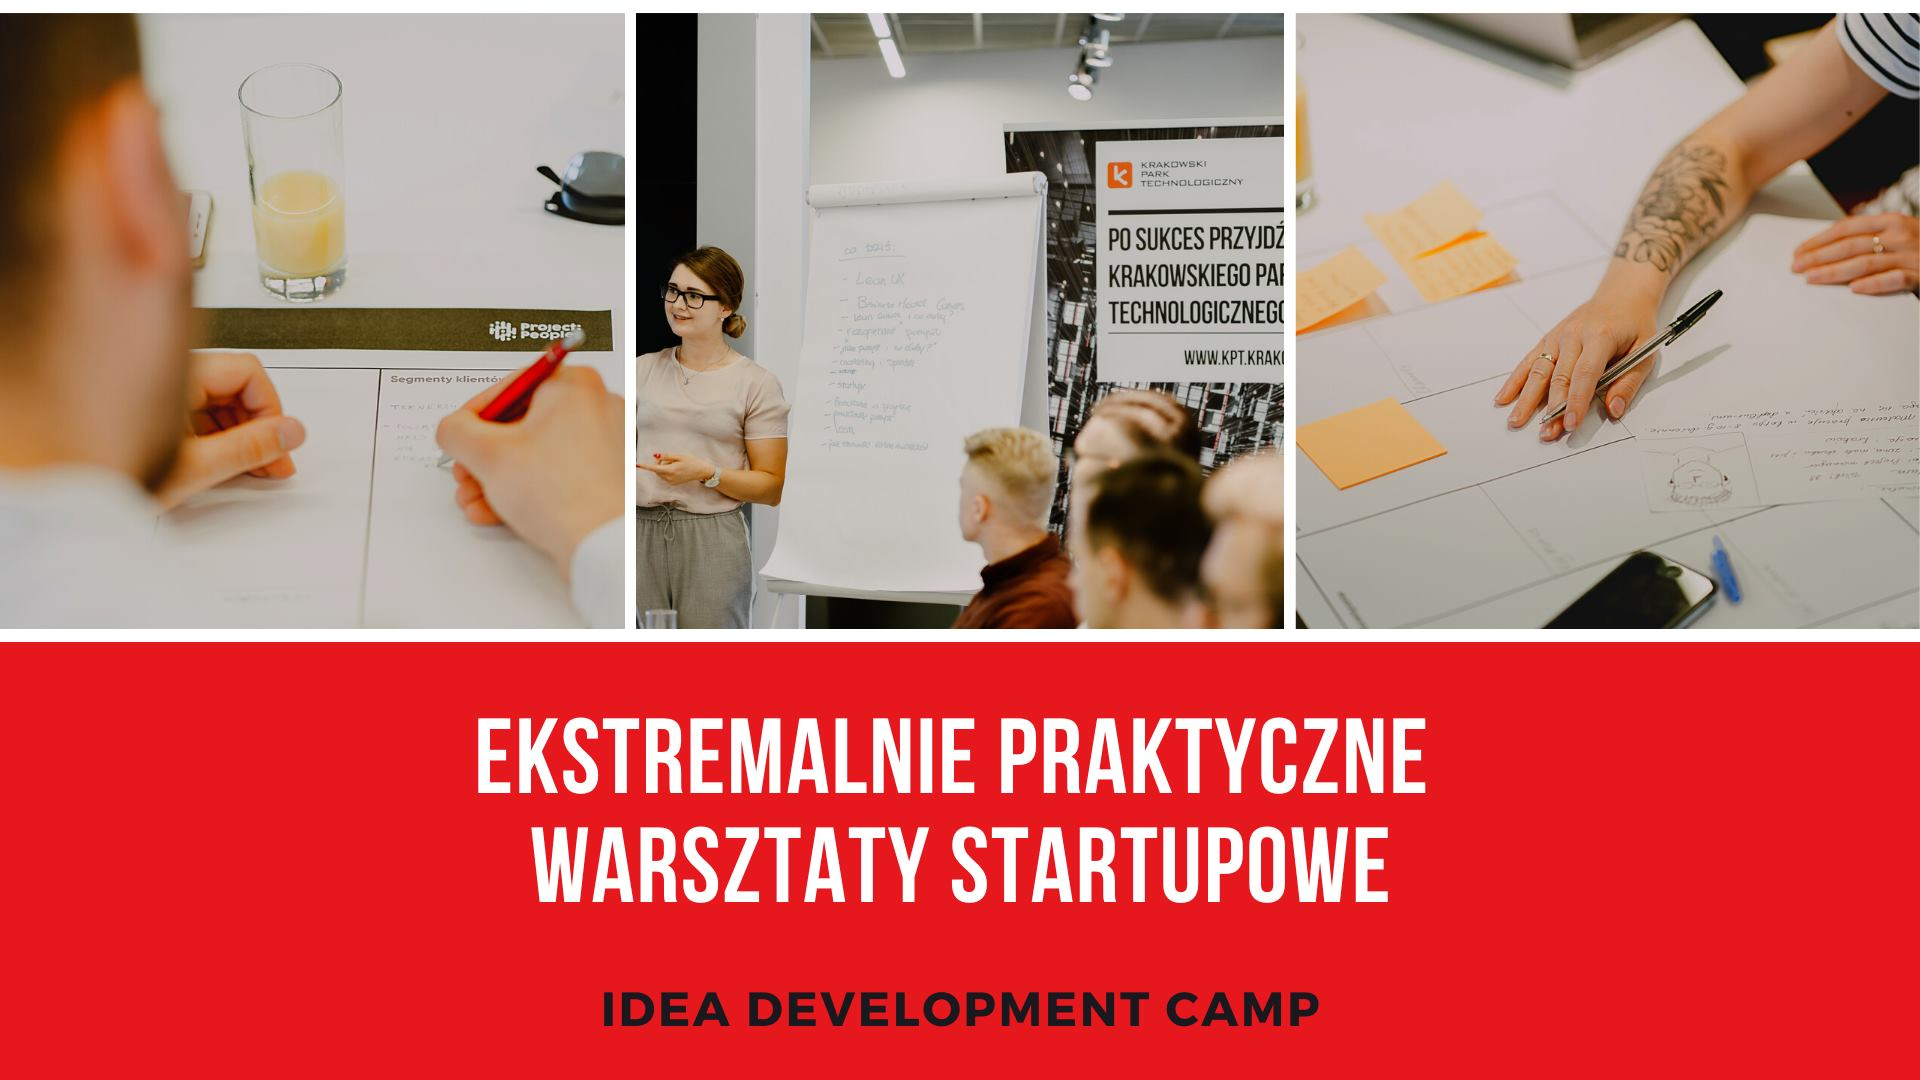 Idea Development Camp